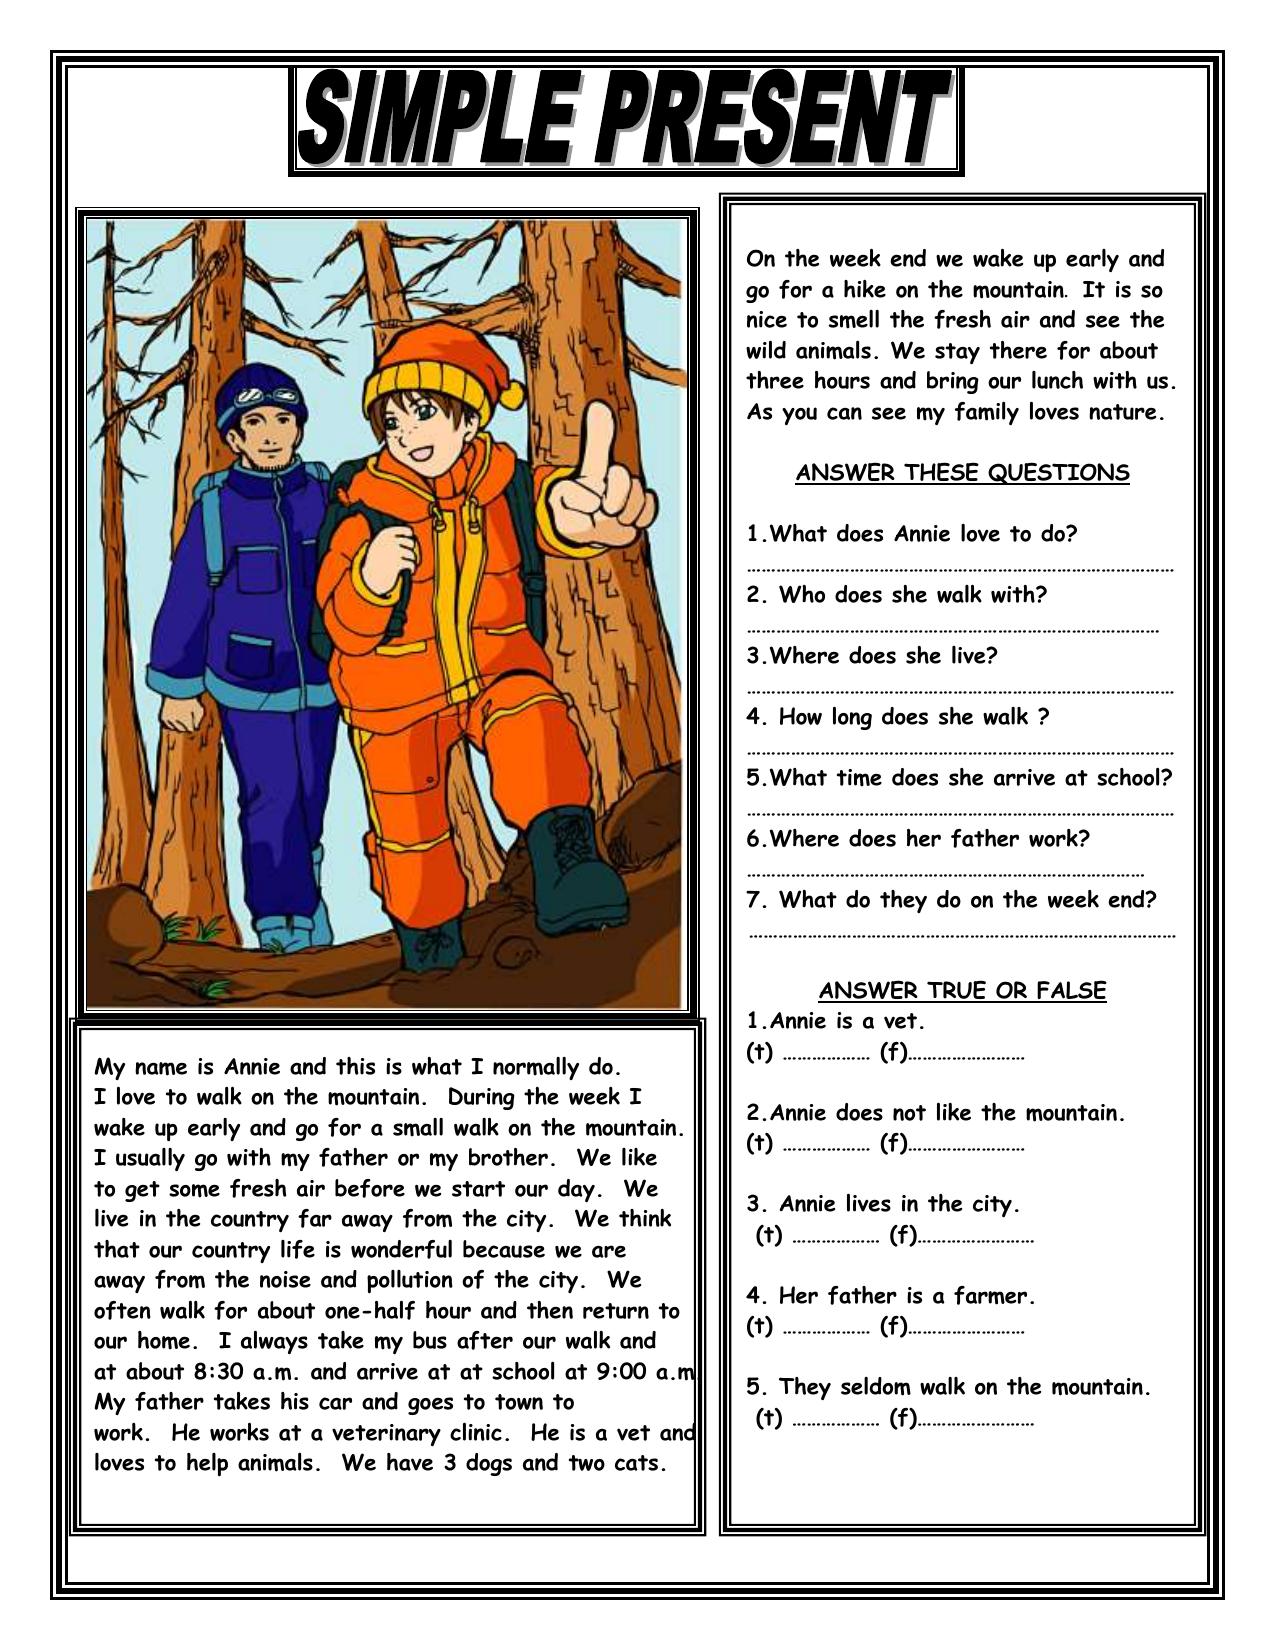 - Simple-present-reading-comprehension-text-grammar-drills-reading